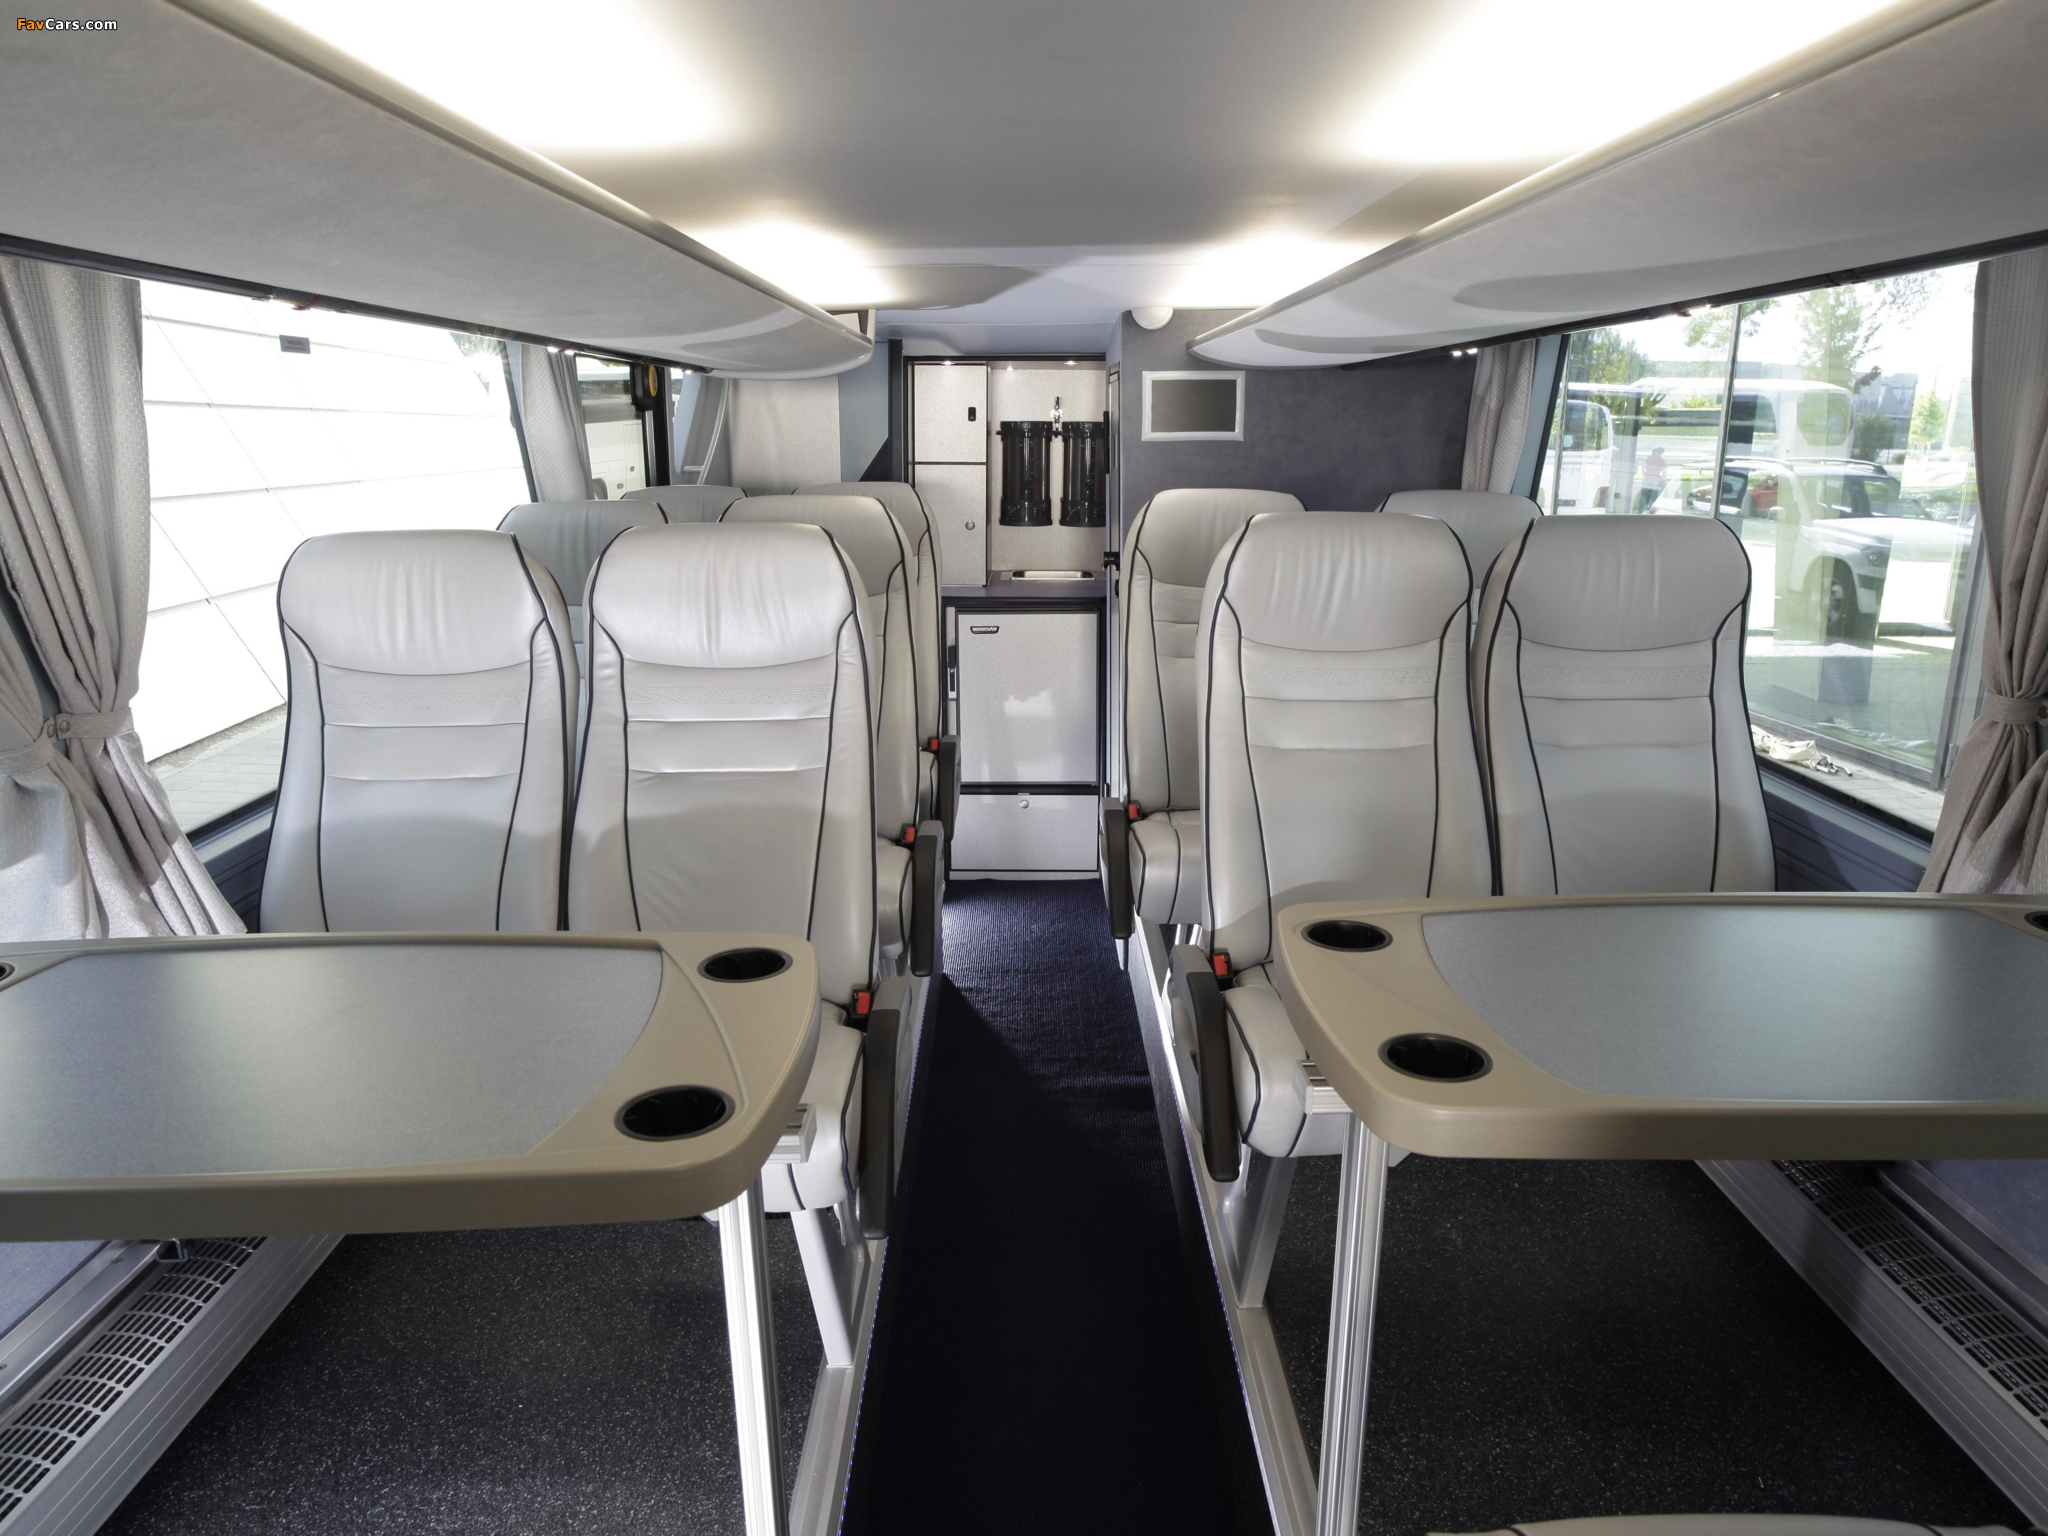 Neoplan Skyliner 2010 photos (2048 x 1536)